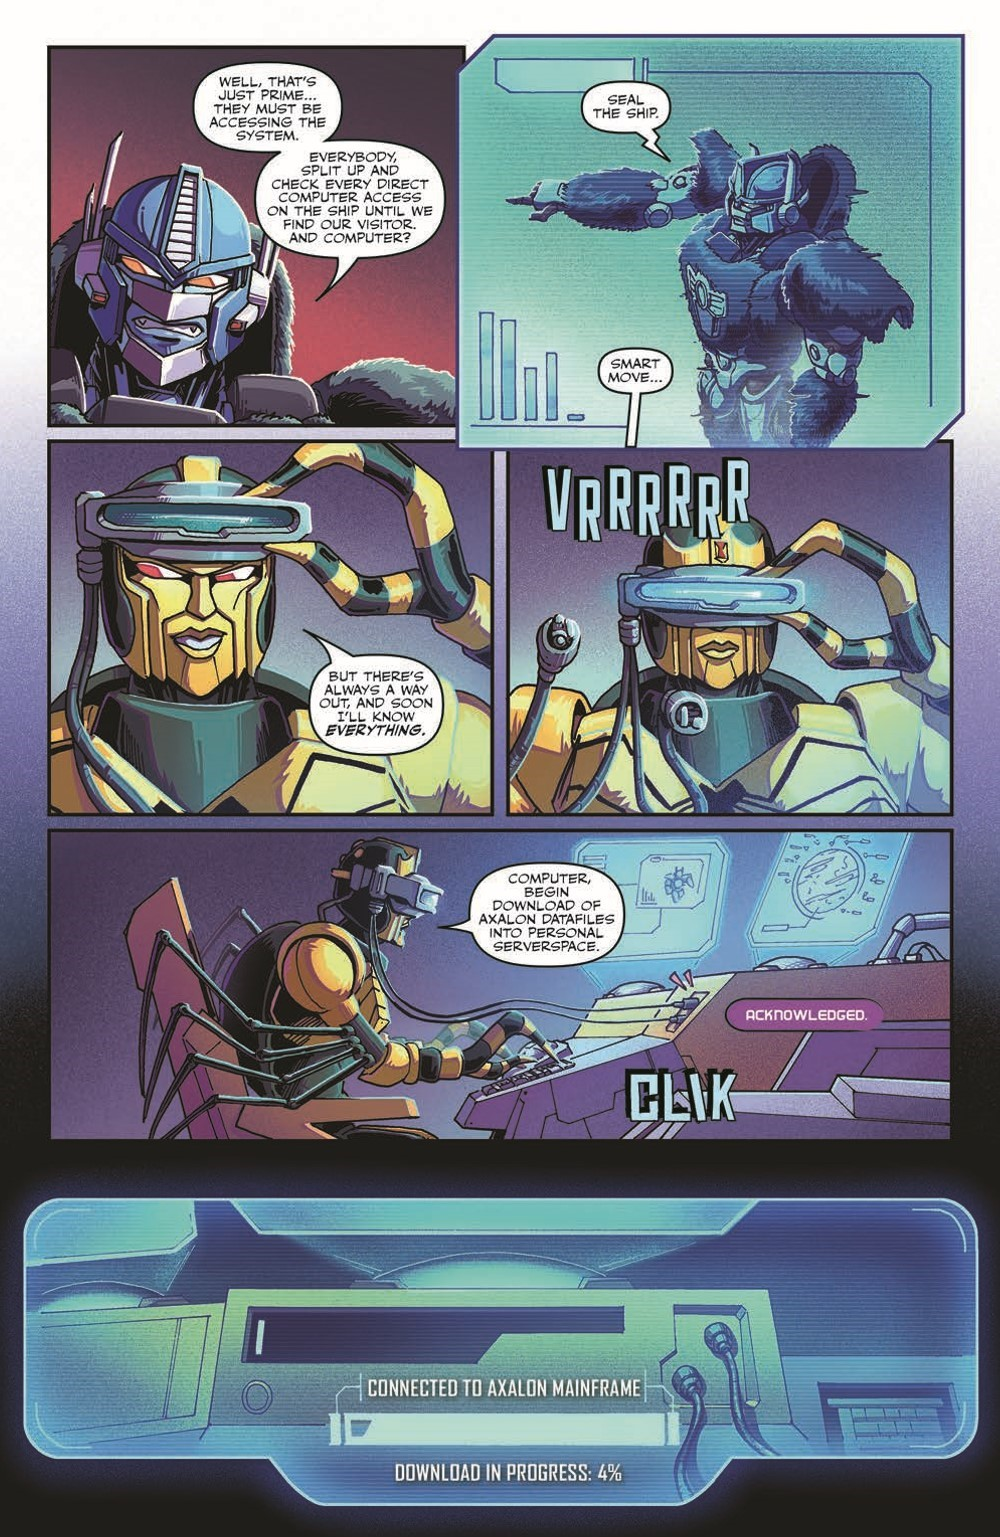 TFBW_08_pr-6 ComicList Previews: TRANSFORMERS BEAST WARS #8